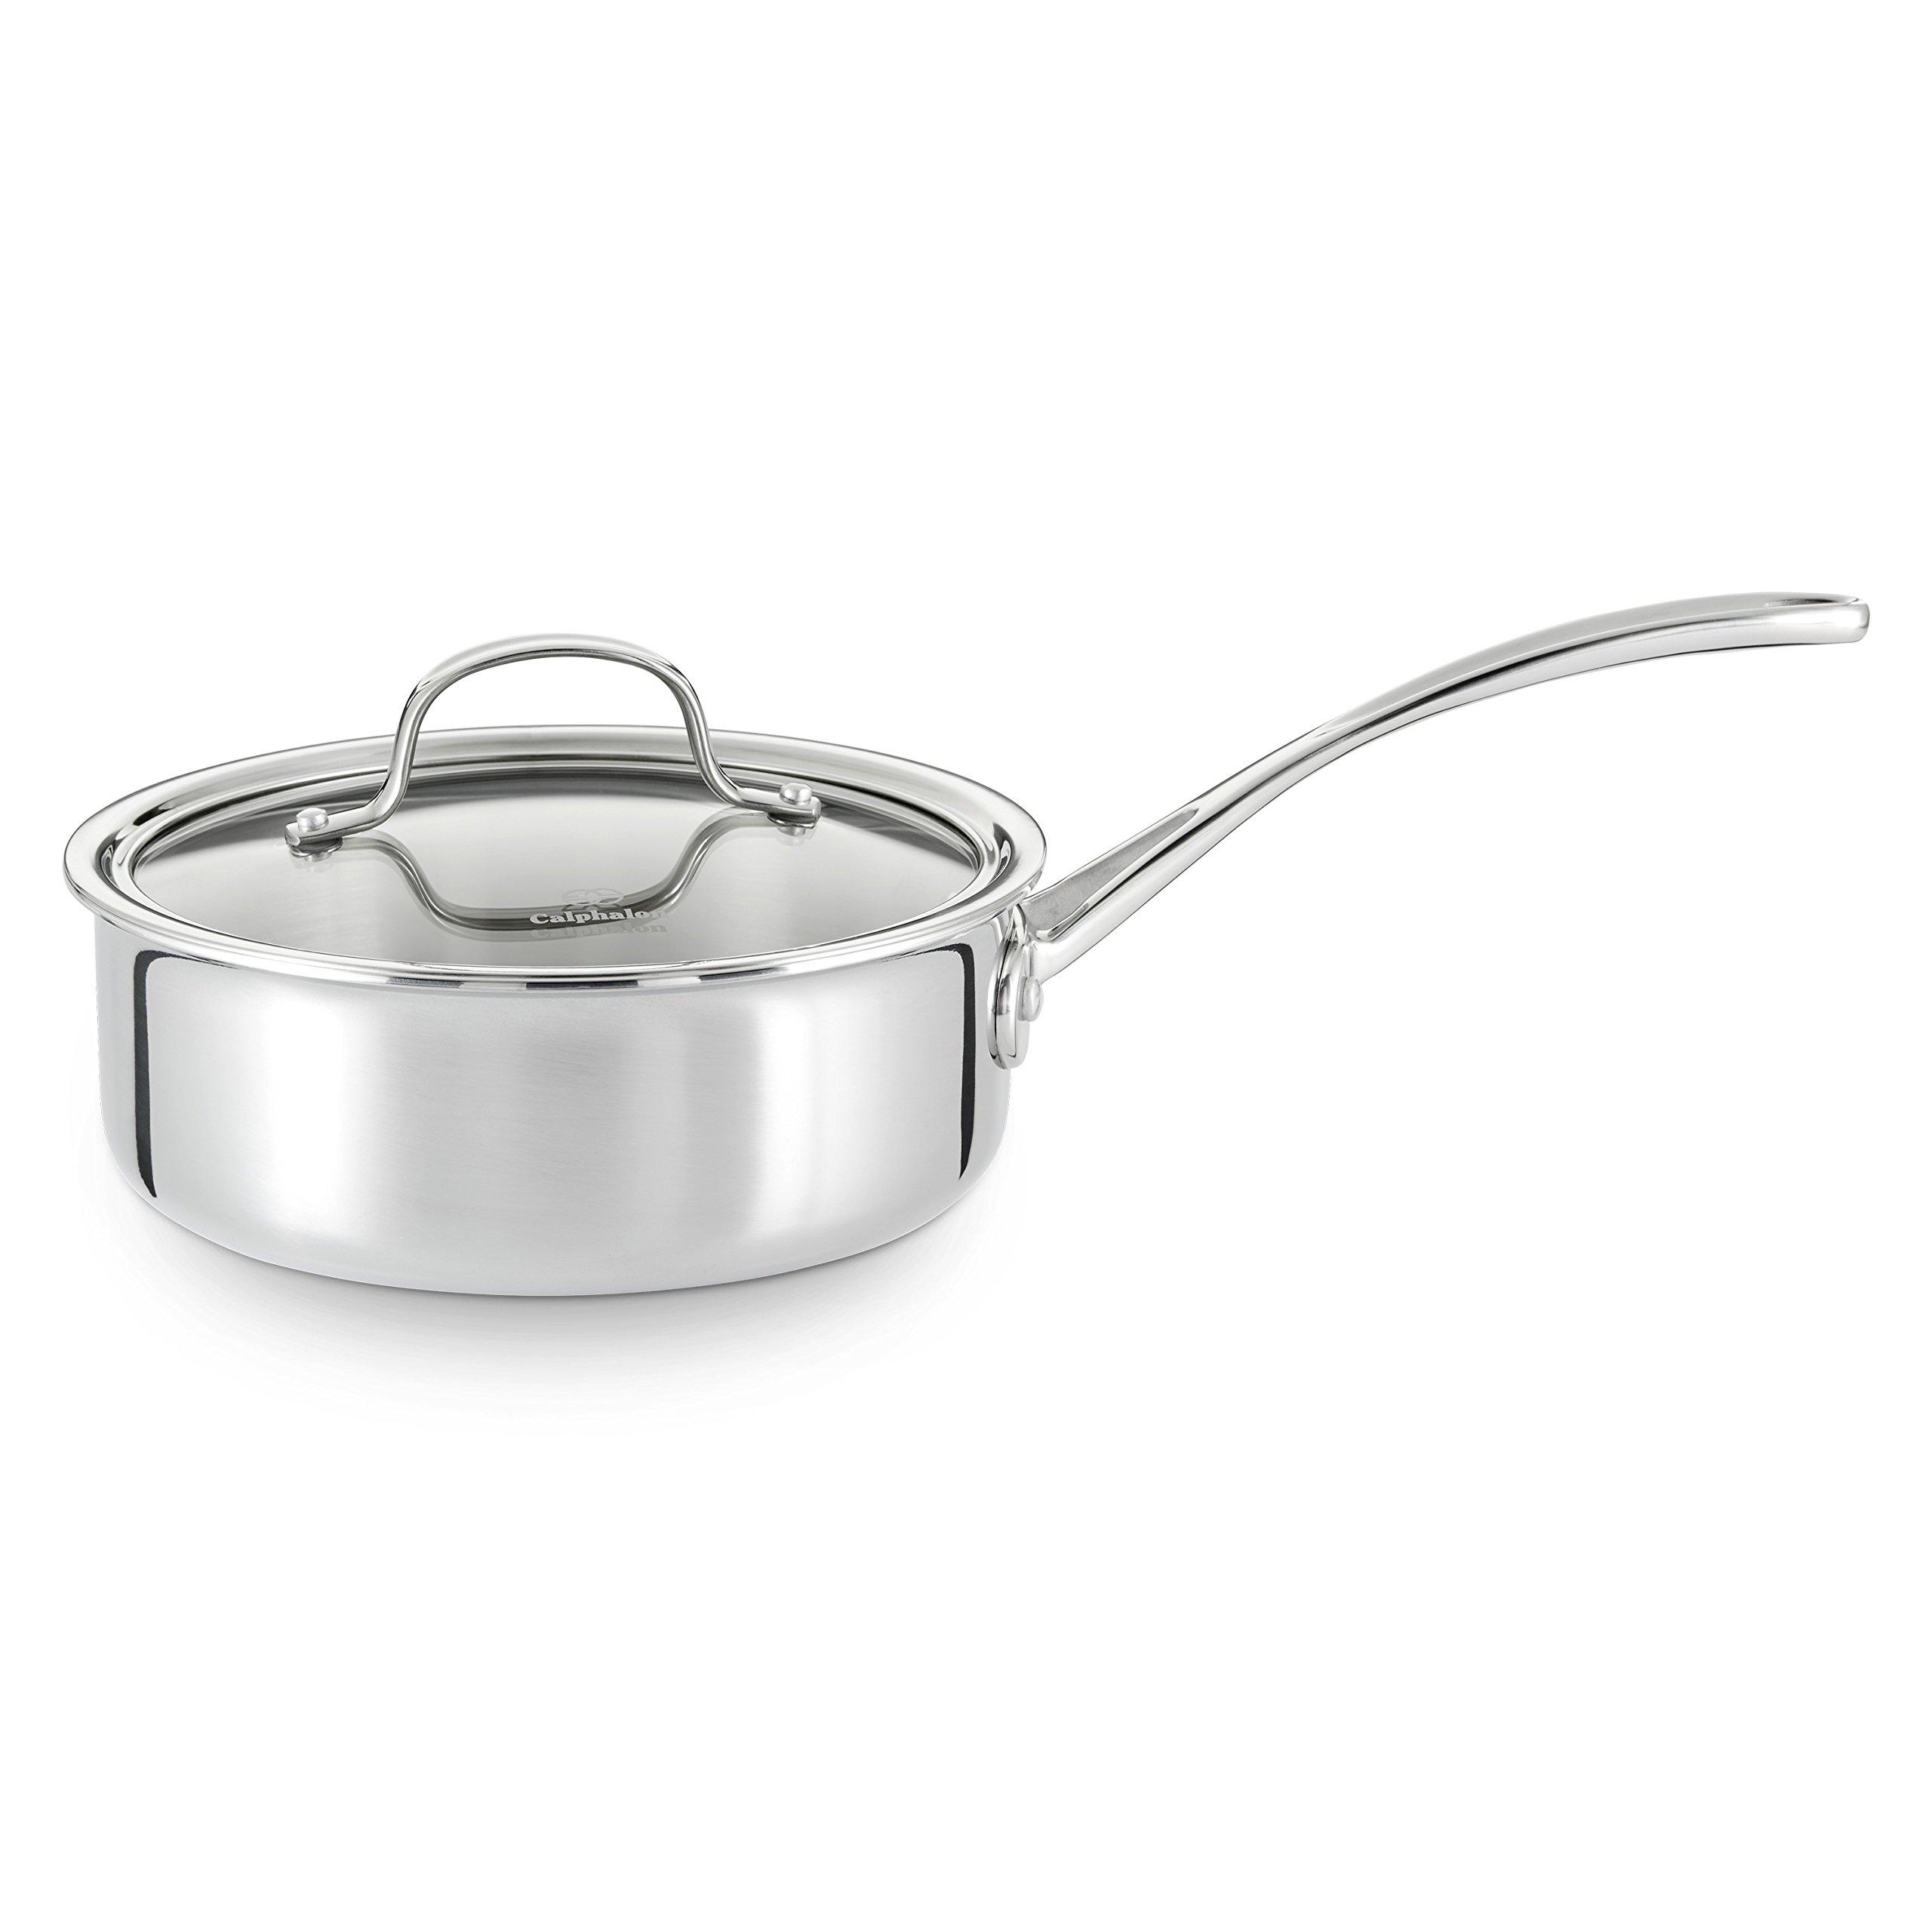 Calphalon Tri-Ply Stainless Steel Cookware, Shallow Sauce Pan, 2 1/2-quart by Calphalon